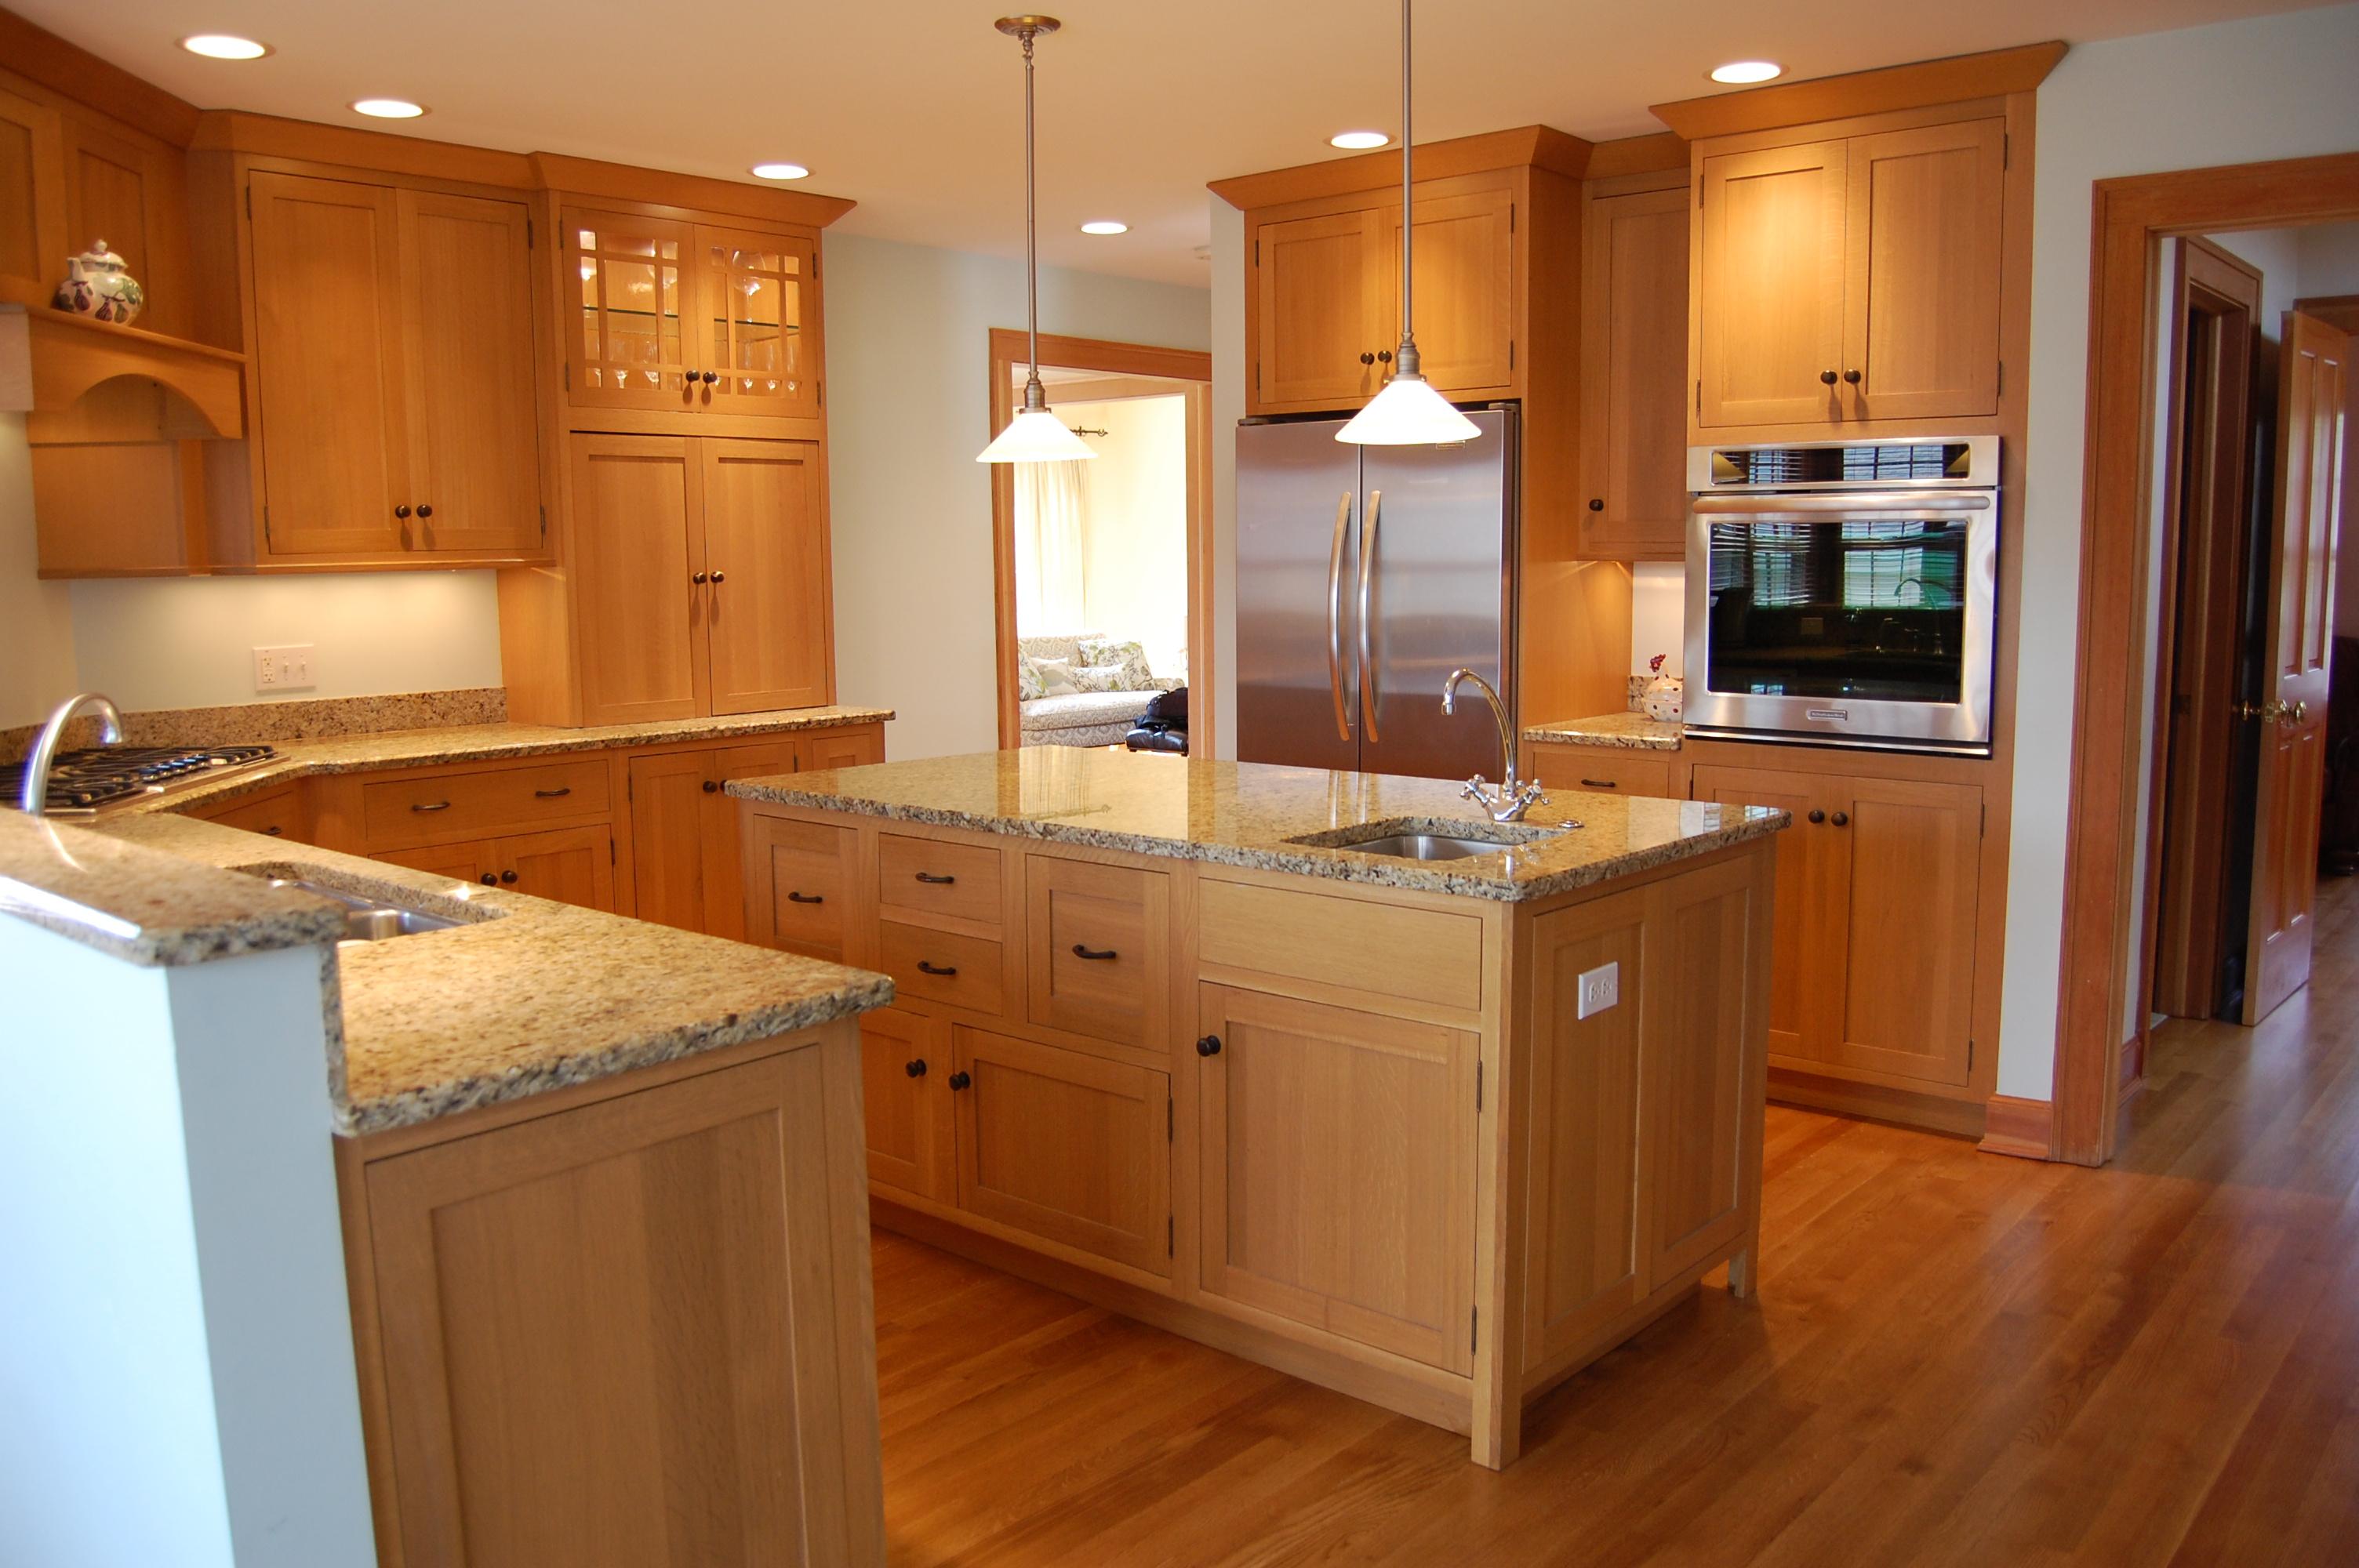 Sexton Hardwood Flooring, LLC image 1